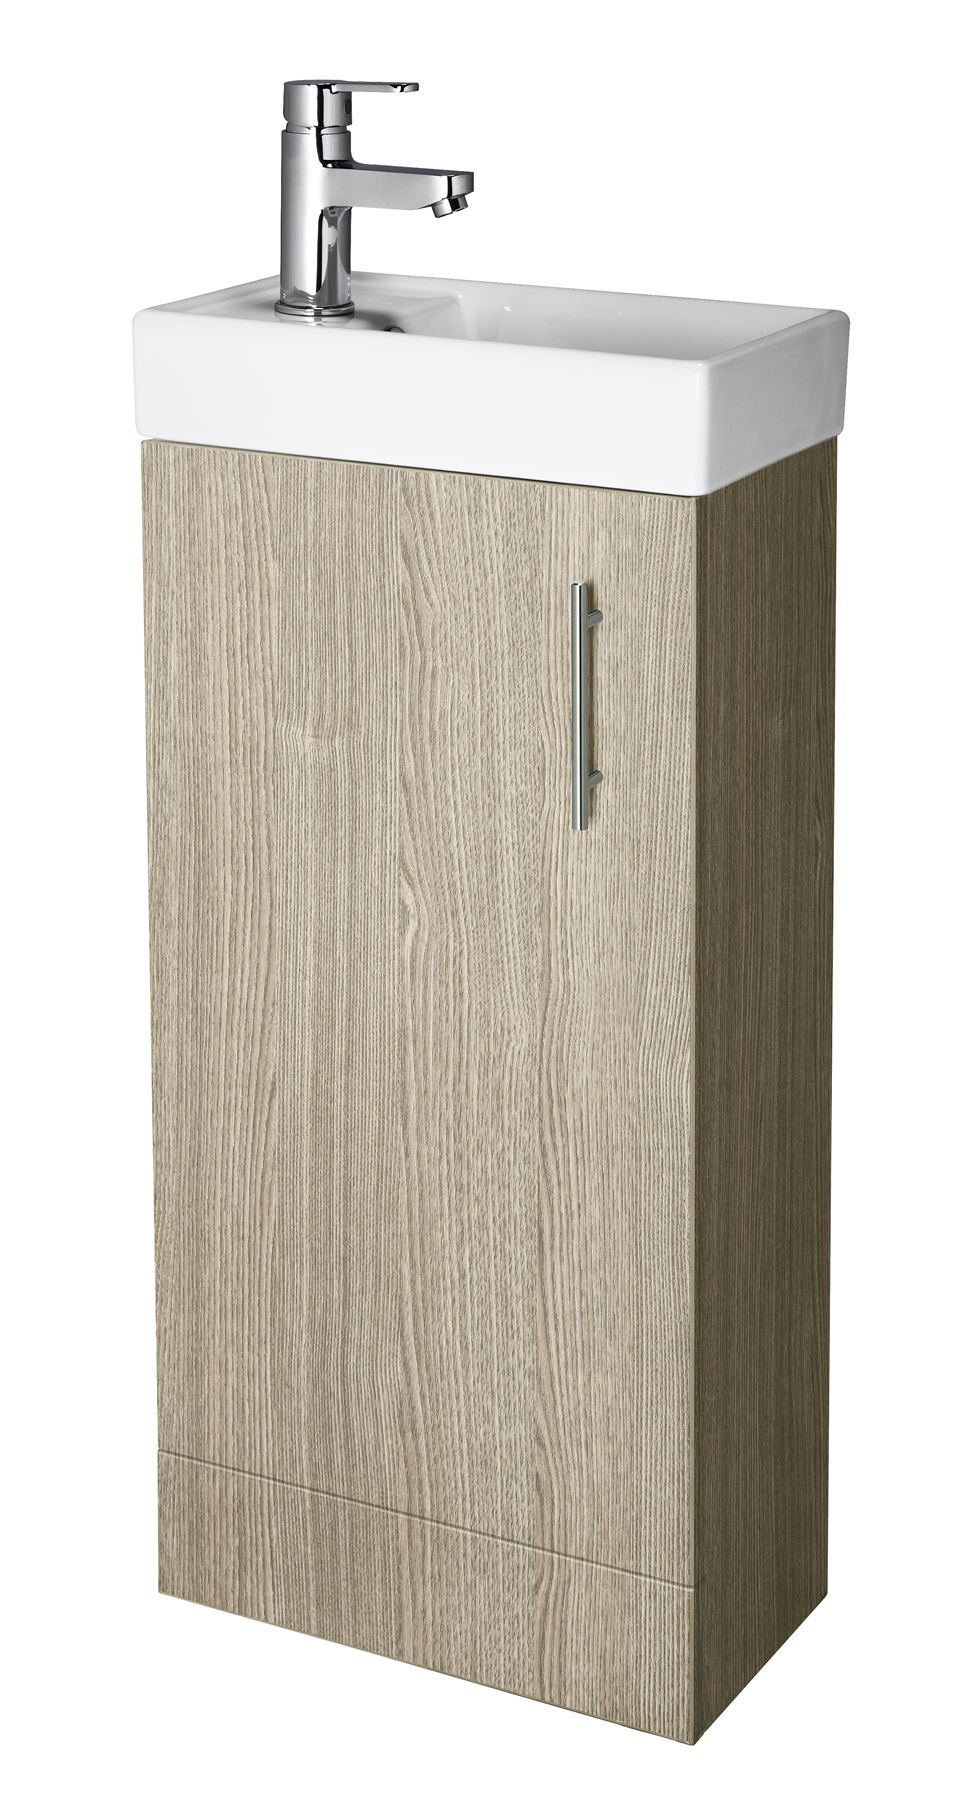 Compact 400mm bathroom cloakroom vanity unit basin sink for Bathroom cabinets 400mm wide